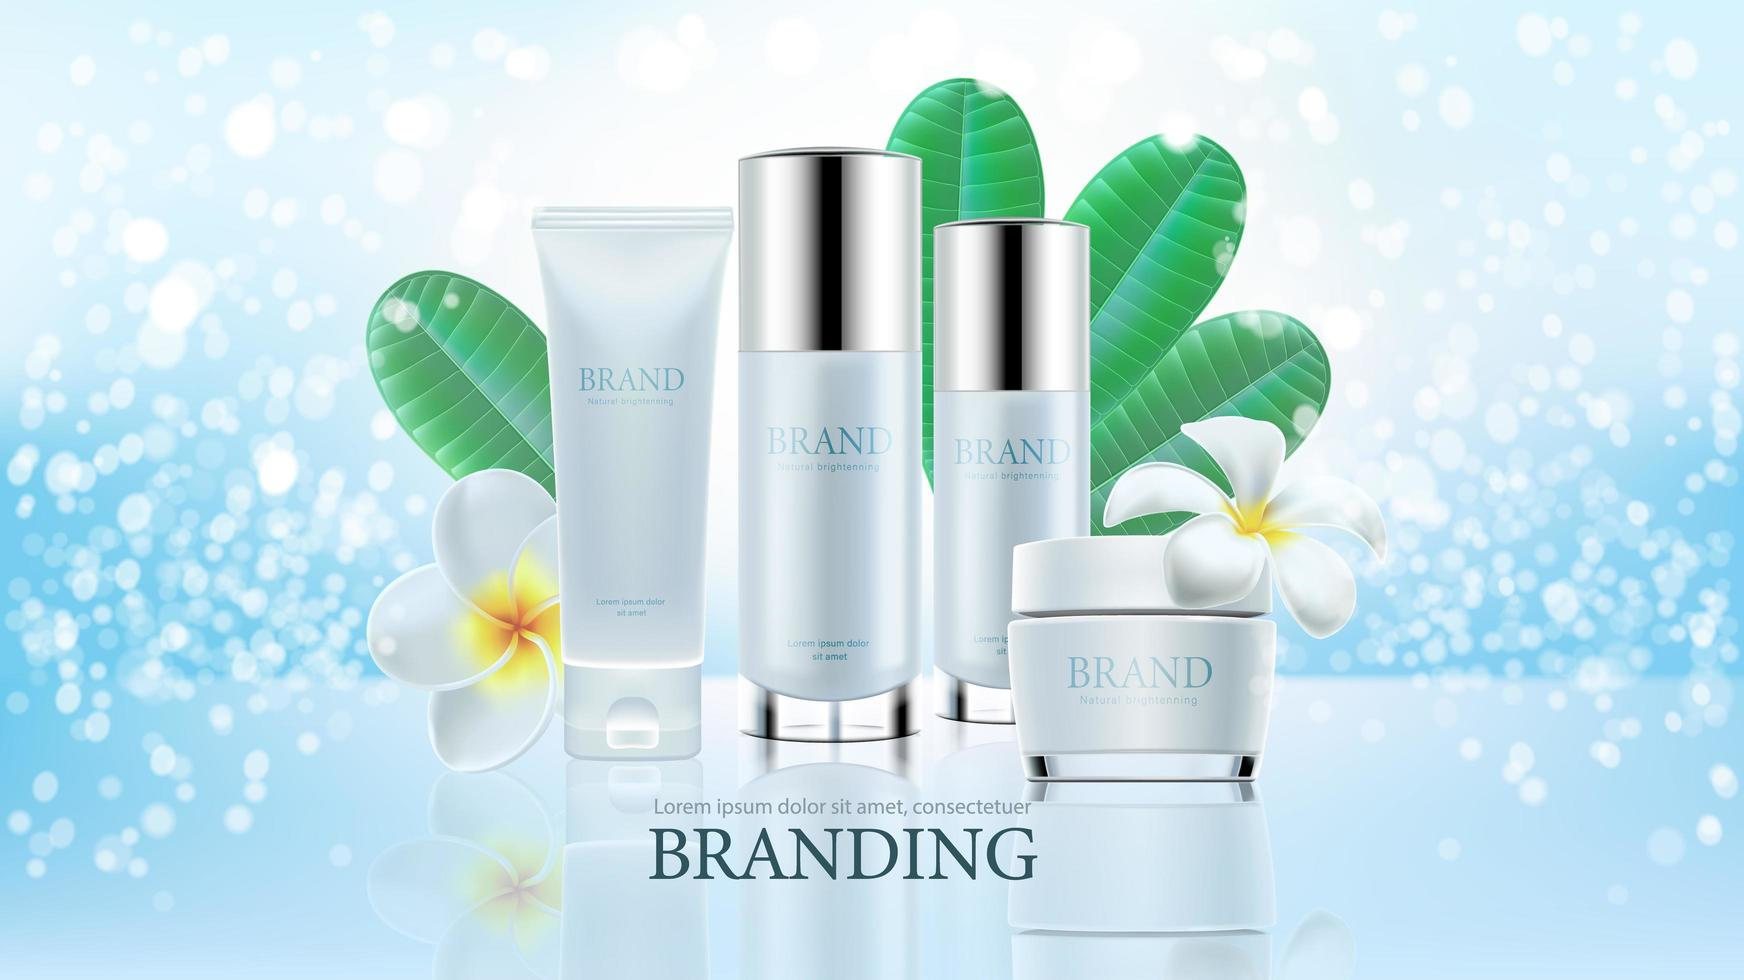 Anuncios de productos cosméticos sobre fondo azul claro vector